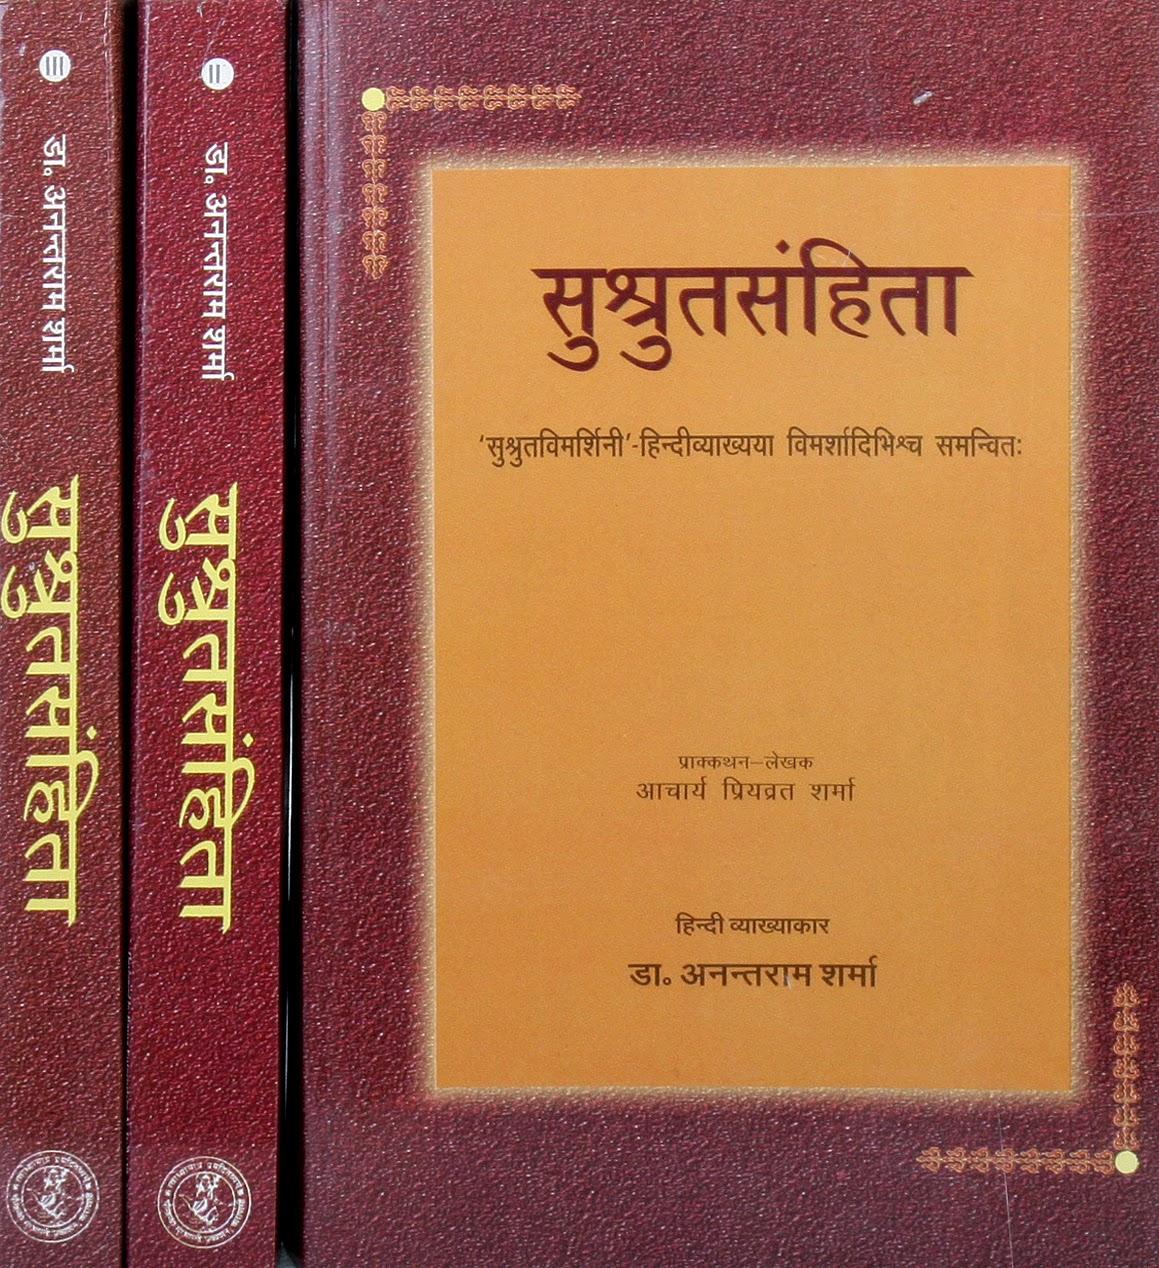 ayurvedic treatment books free download